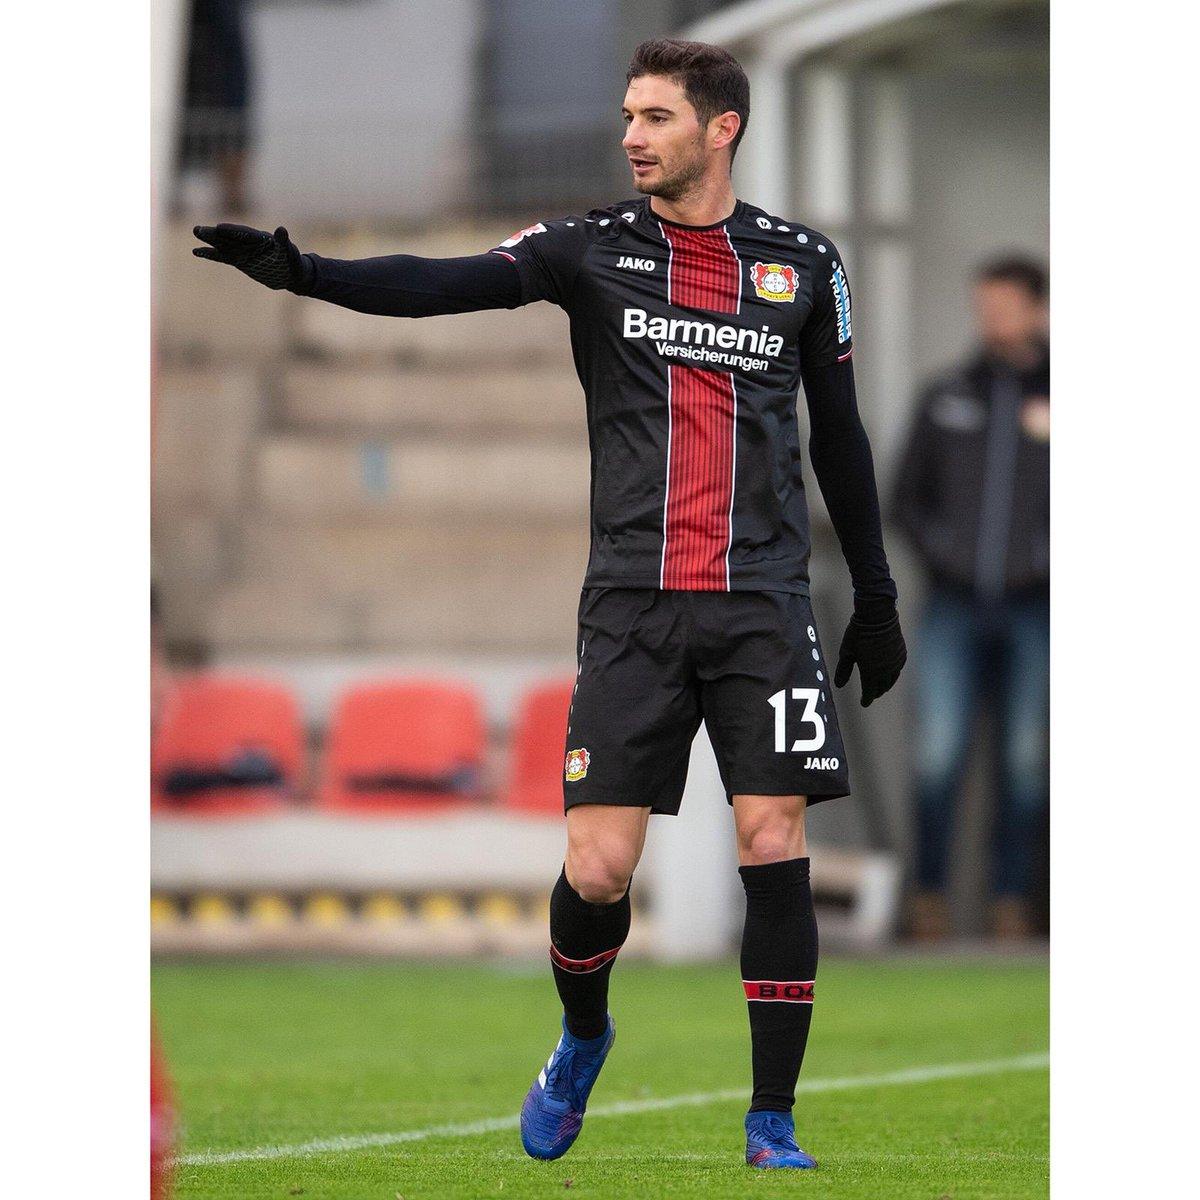 Lucas Moura Goals And Assists 2017: Lucas Alario - Striker